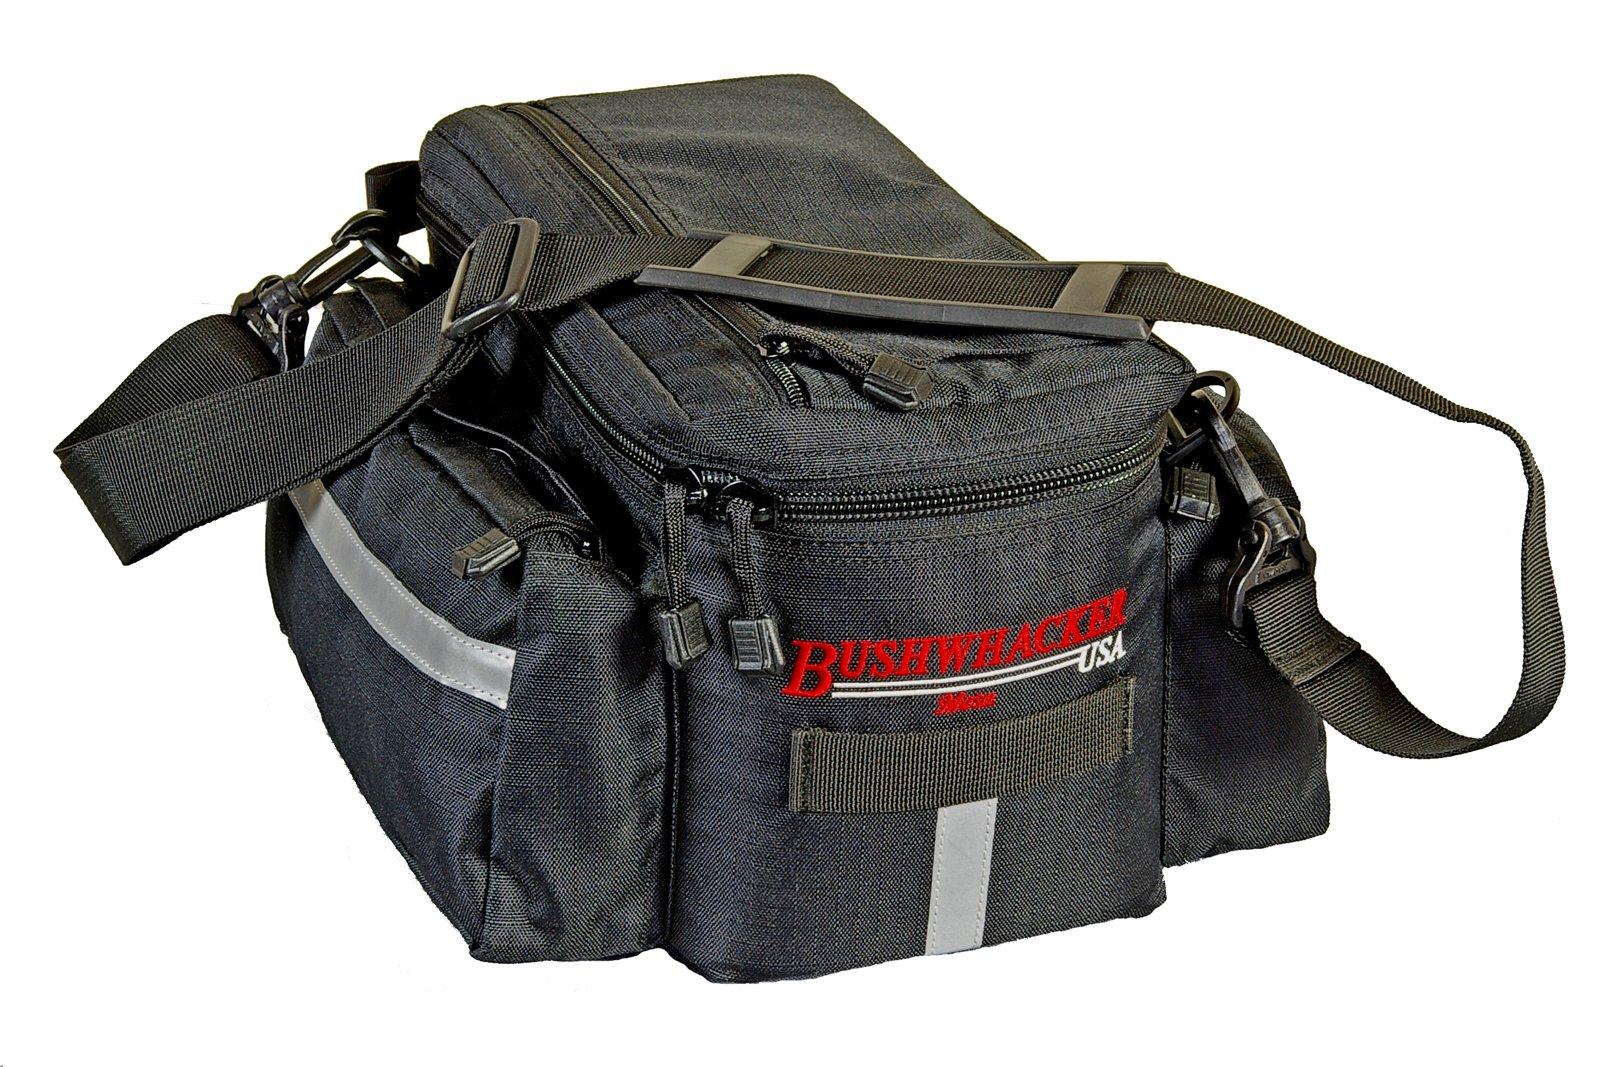 Bushwhacker® Mesa Trunk Bag Black - w/ Rear Light Clip Attachment & Reflective Trim - Bicycle Trunk Bag Cycling Rack Pack Bike Rear Bag by Bushwhacker (Image #2)